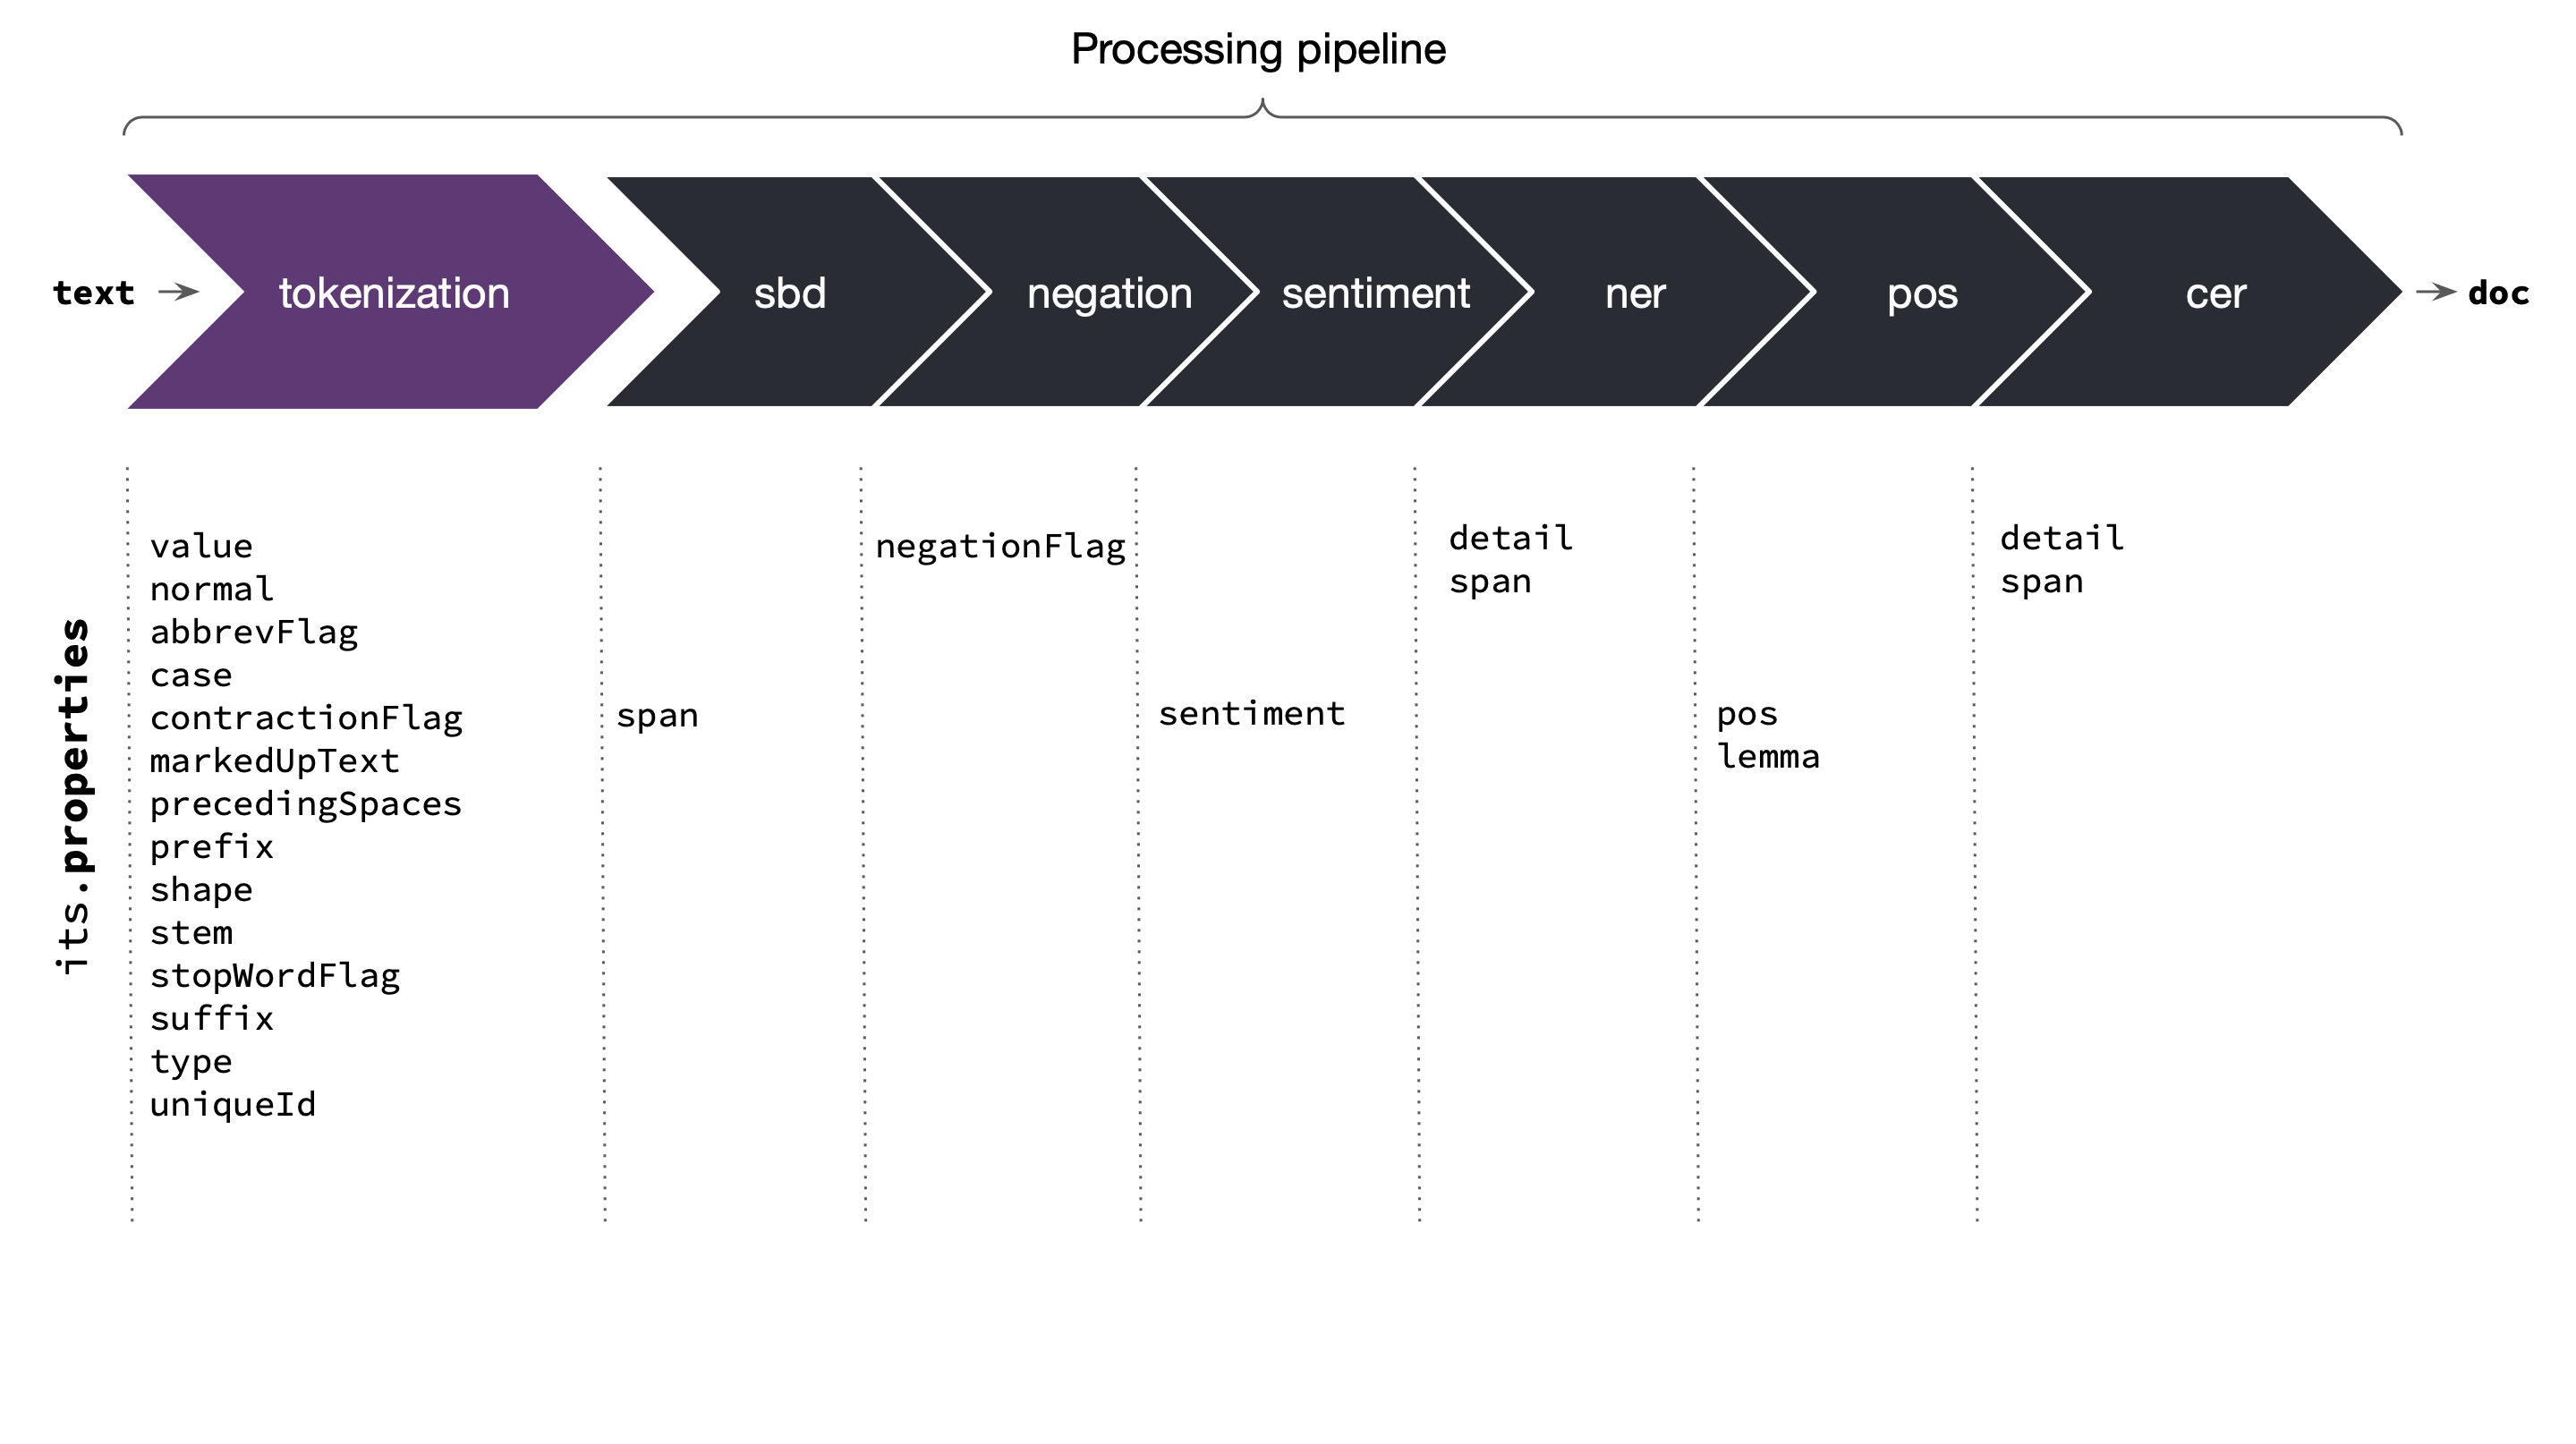 Processing pipeline: text, tokenization, SBD, negation, sentiment, NER, POS, CER